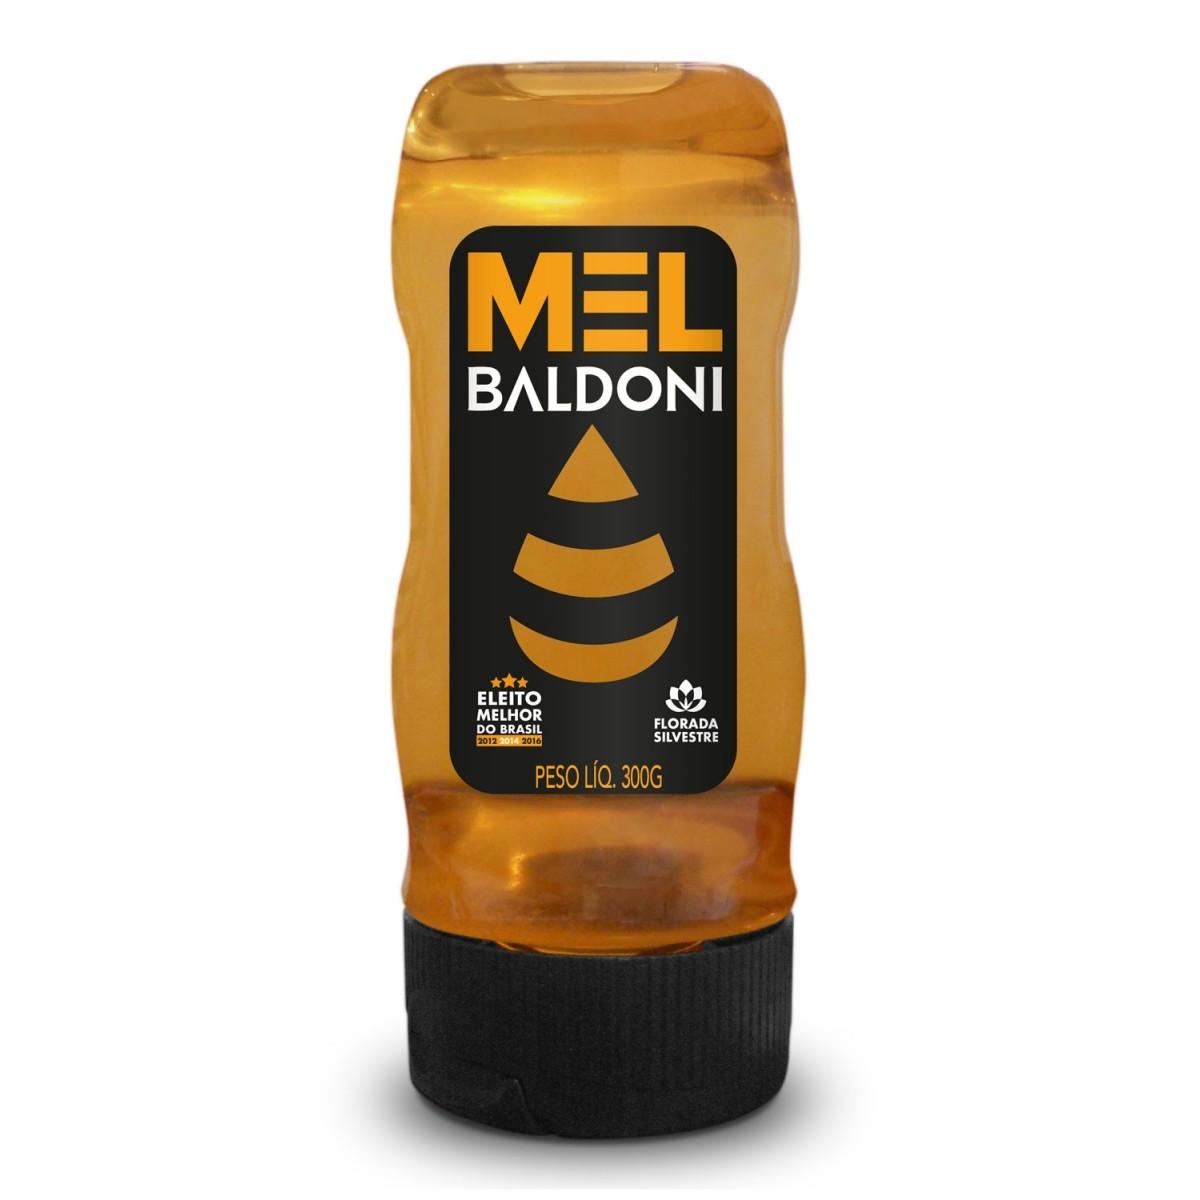 MEL BALDONI BISNAGA DSC 300G